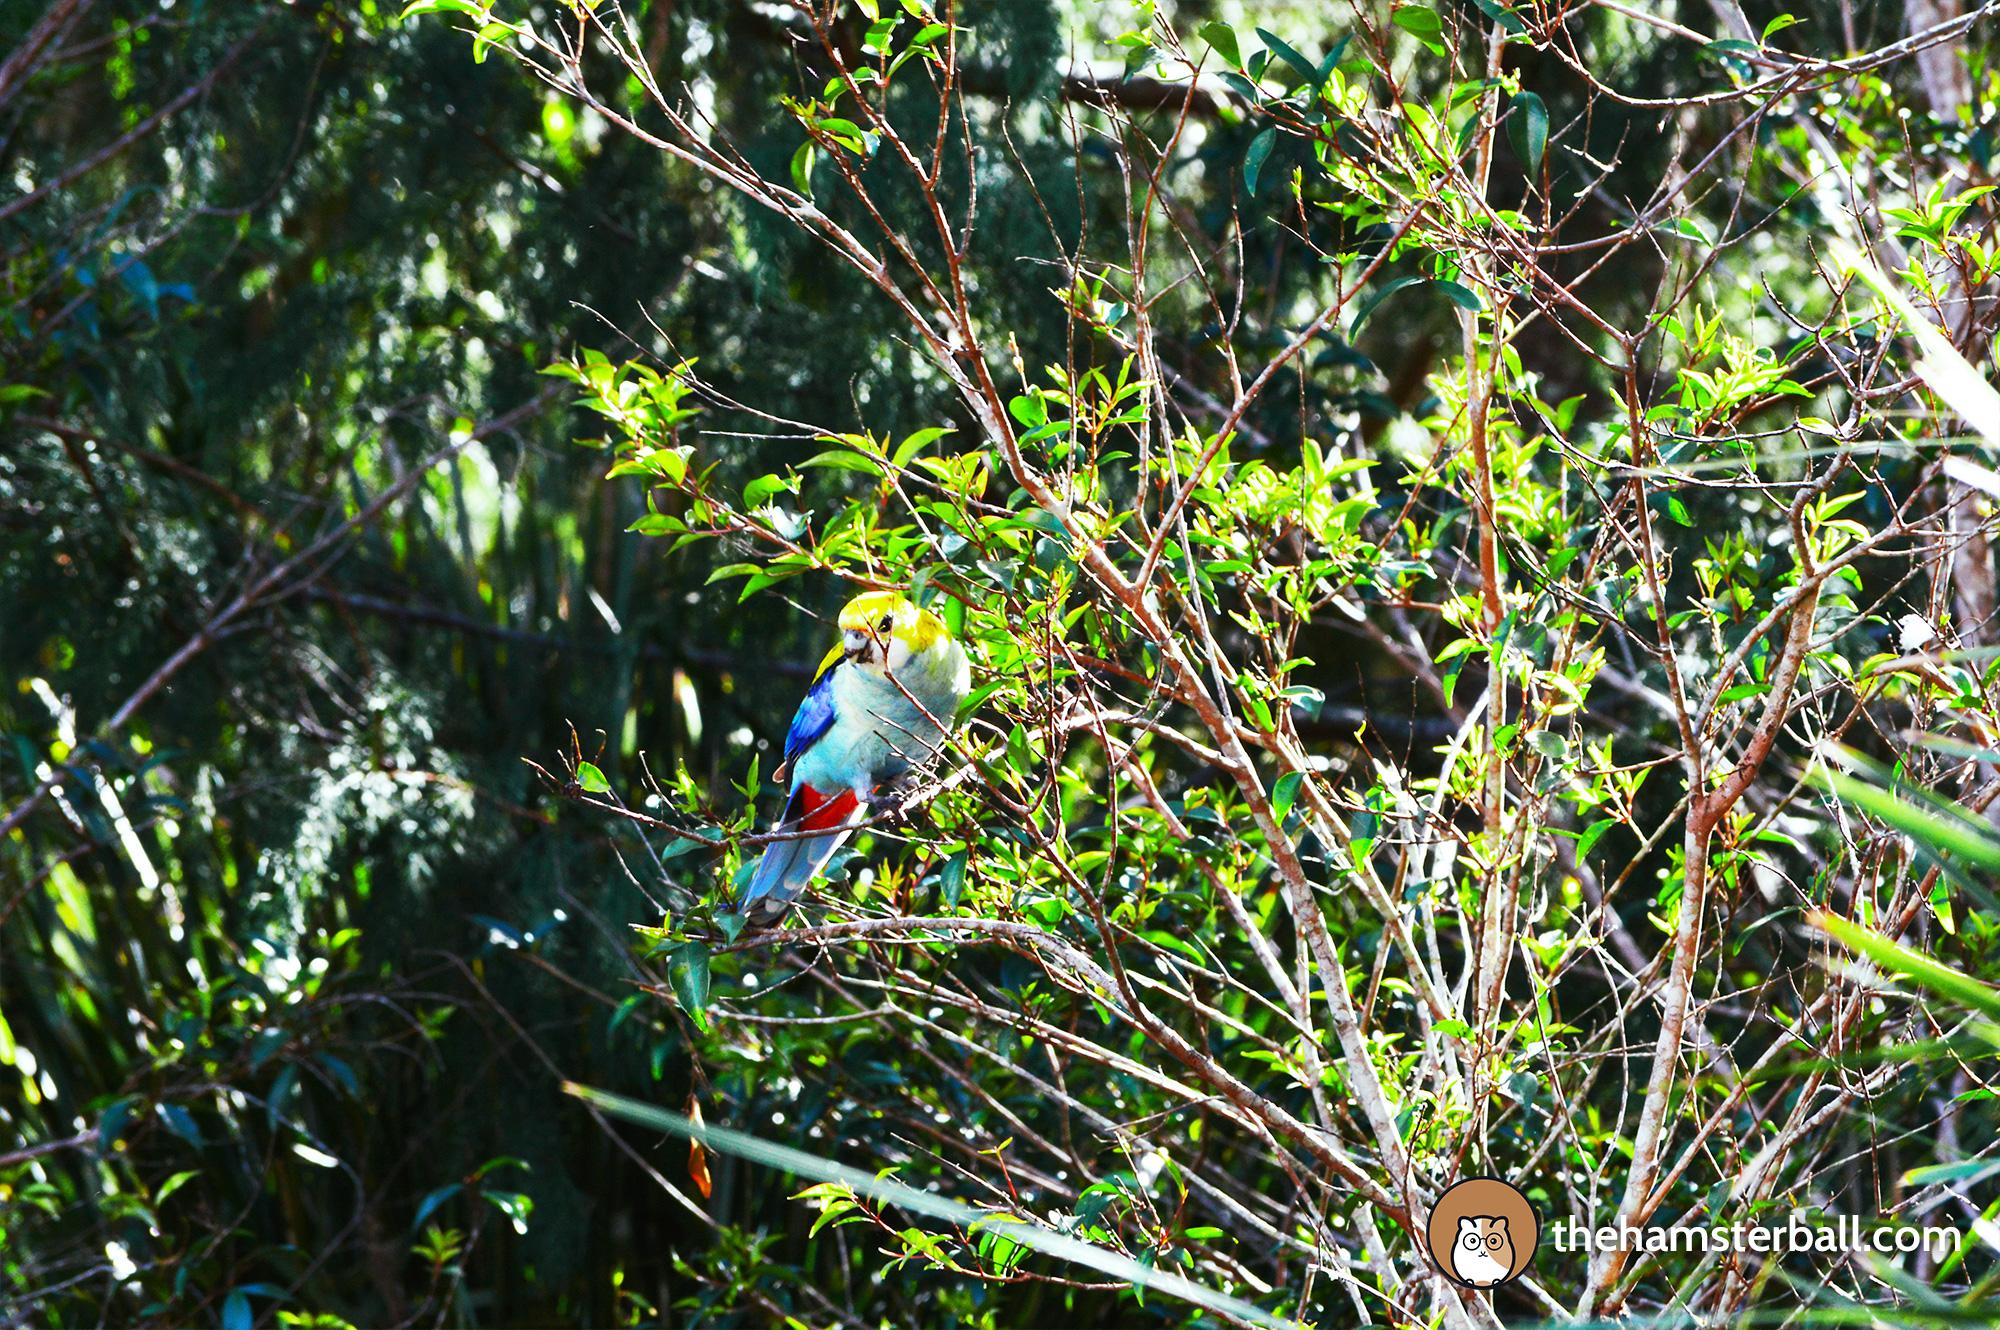 The Fudge Shop, Springbrook, cockatoos, environment, nature, crimson rosella, pale headed rosella